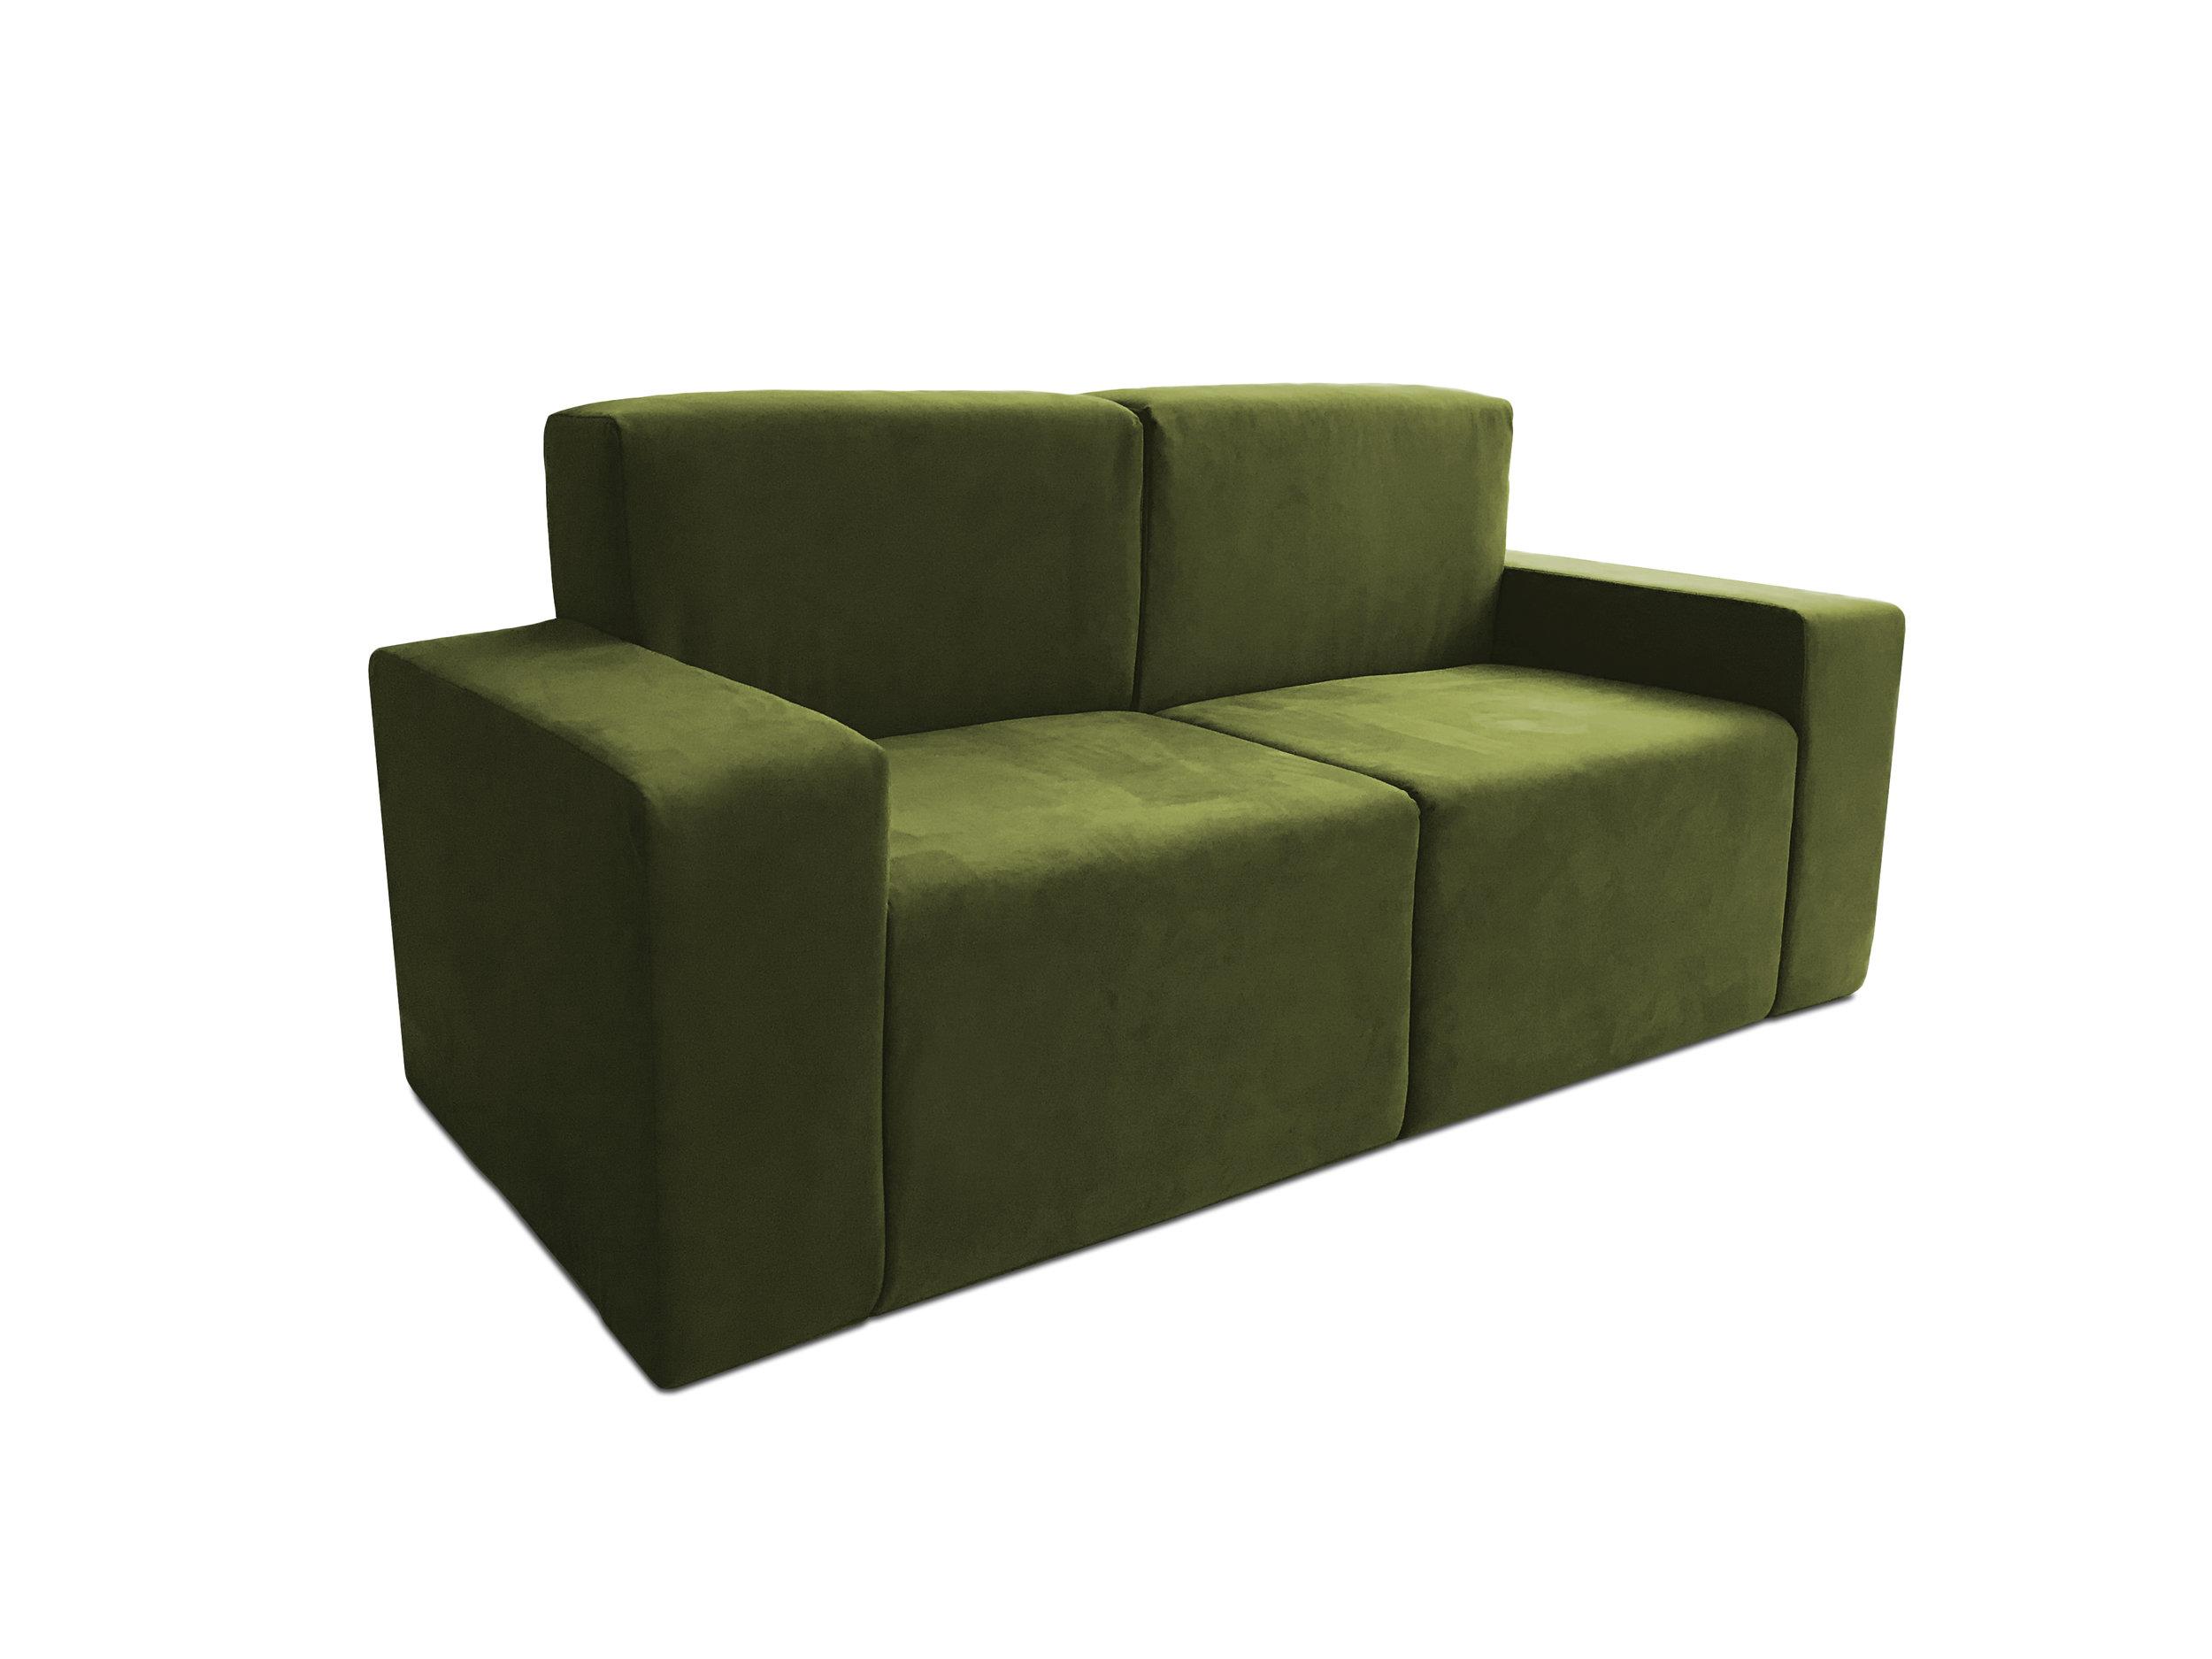 harmless sofa final image.jpg